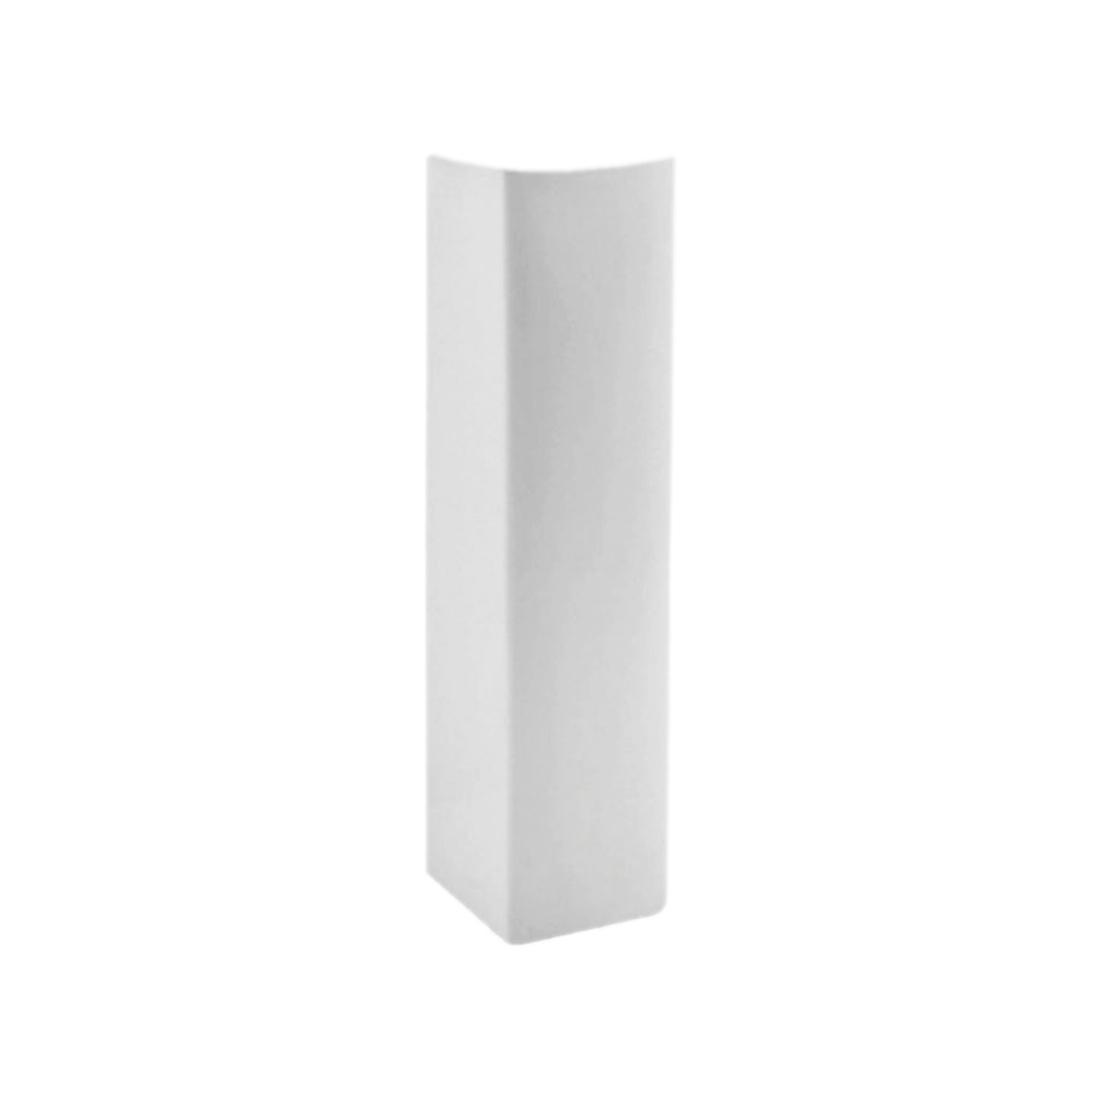 Kerovit 311 Full Pedestal